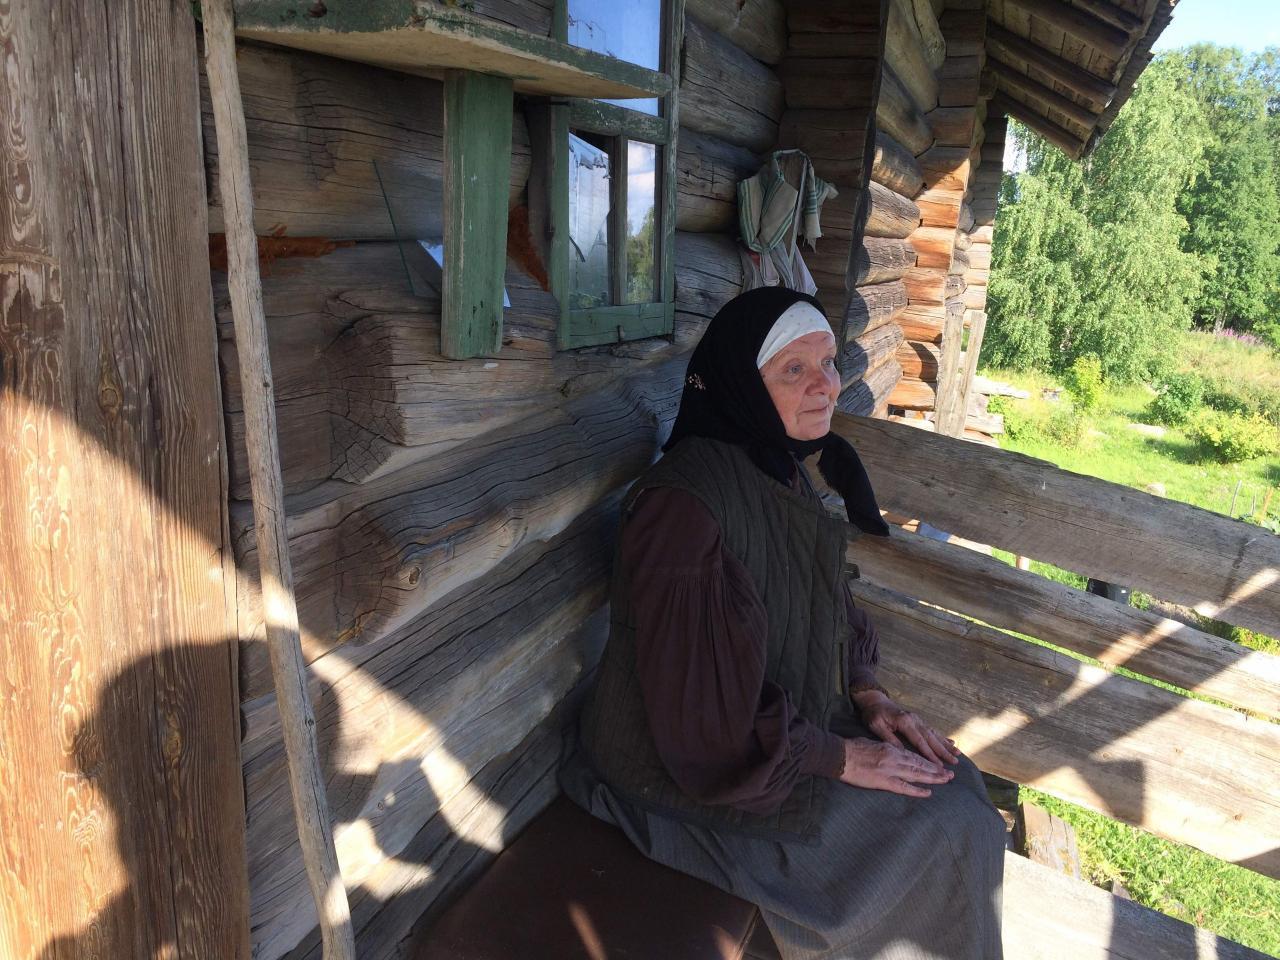 Галина Эльбрусовна Козулина